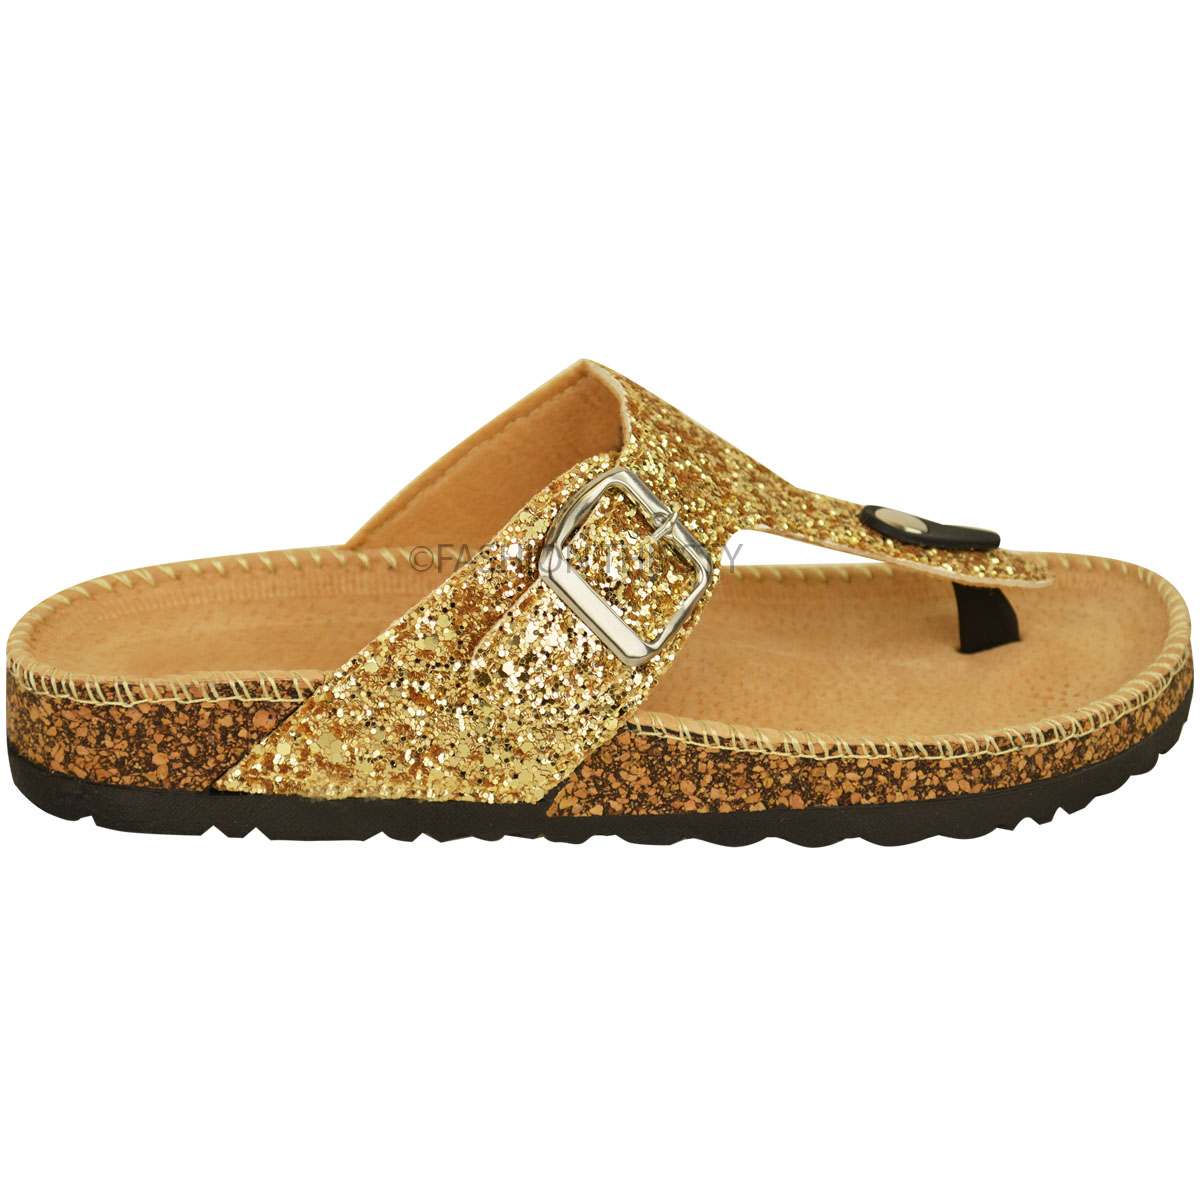 ladies womens flat sandals glitter flip flops slip on toe post thong grip size ebay. Black Bedroom Furniture Sets. Home Design Ideas